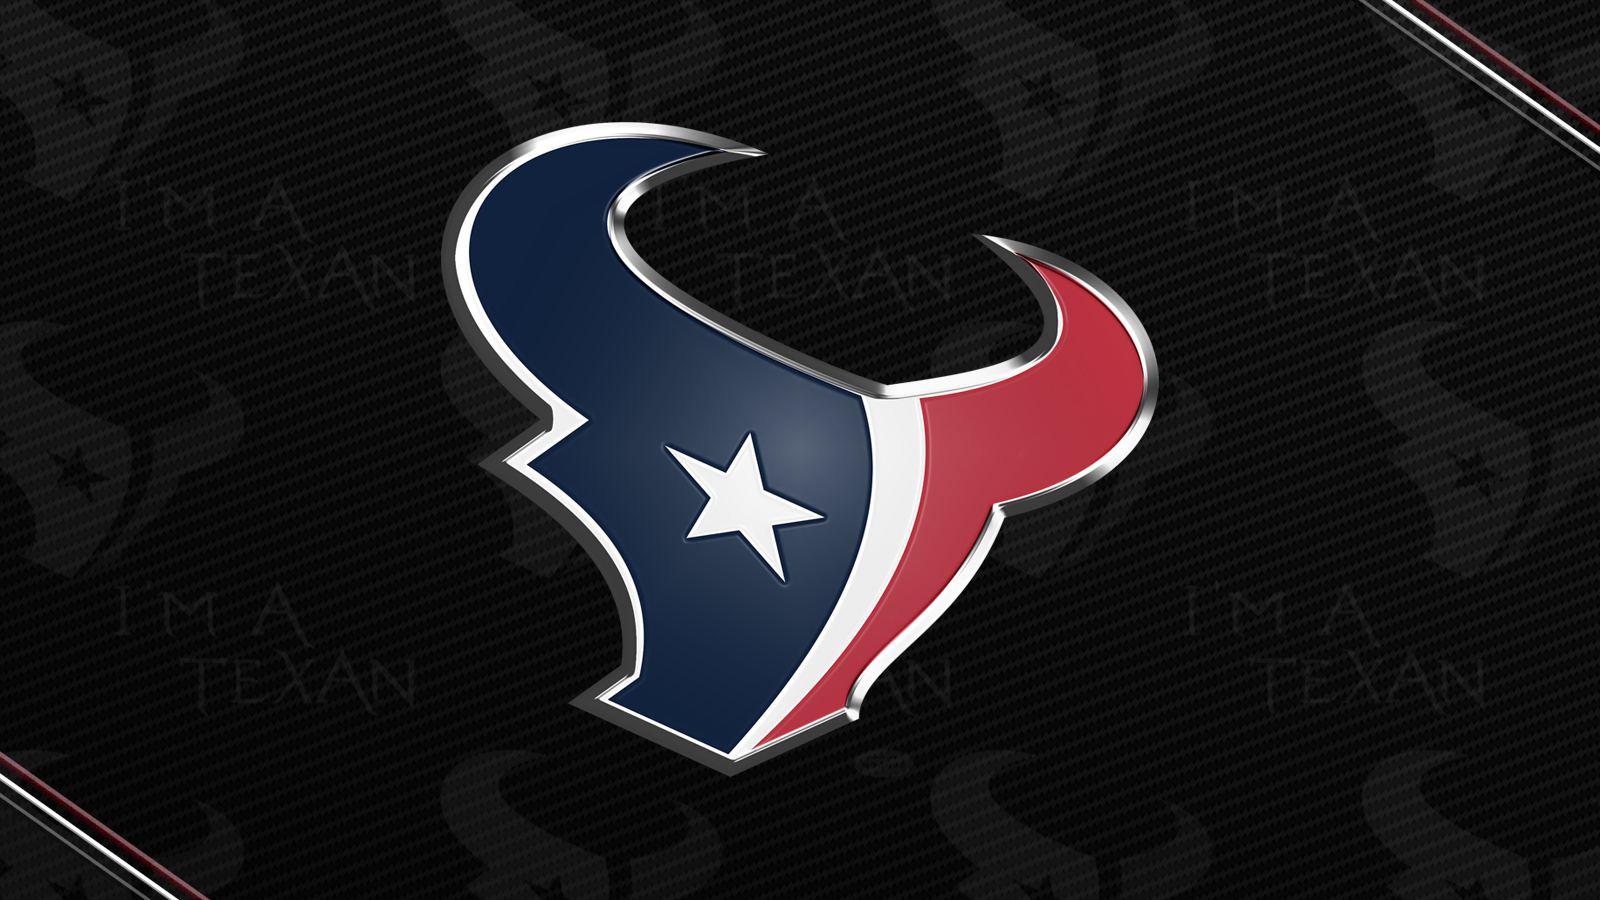 10 HD Houston Texans Wallpapers - HDWallSource.com